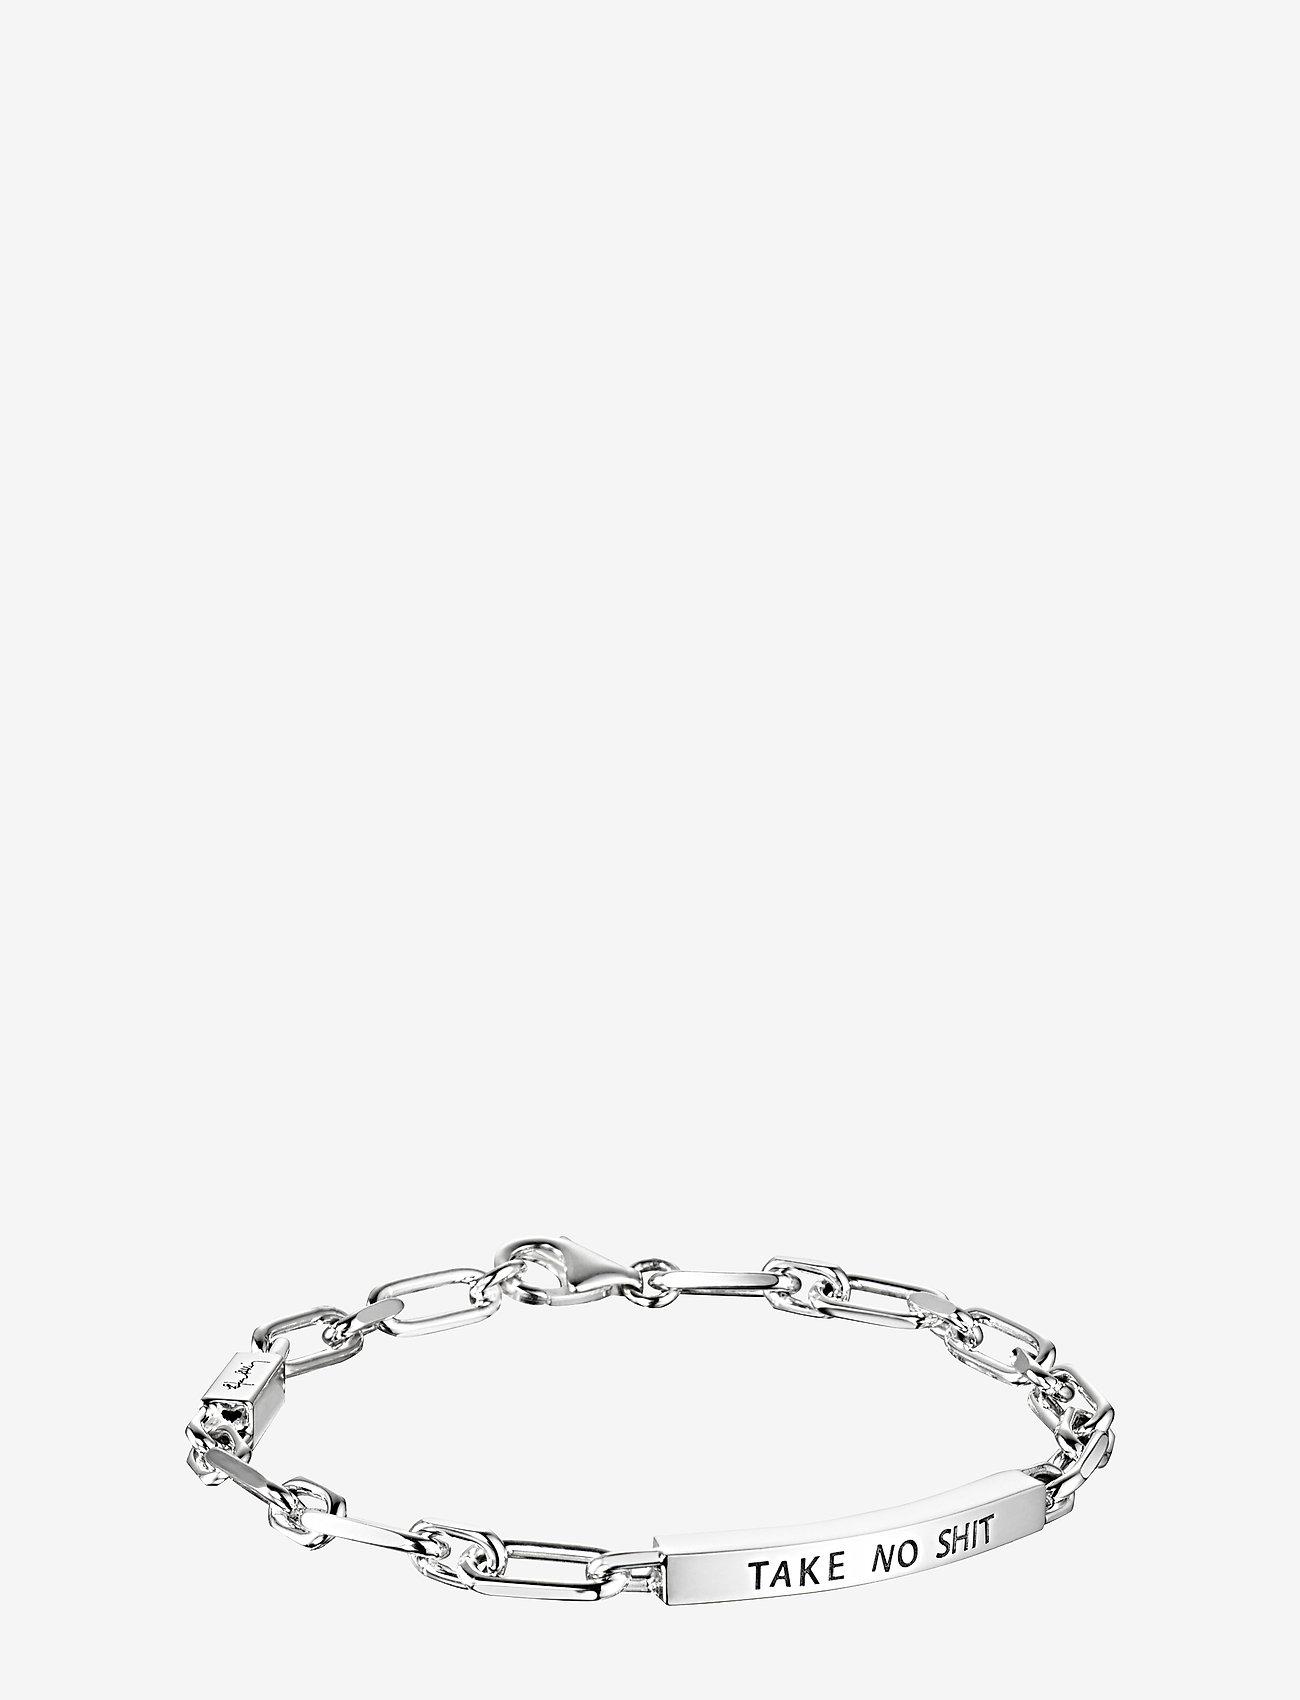 Efva Attling - Thin Silver Bracelet - Take No Shit - dainty - silver - 1